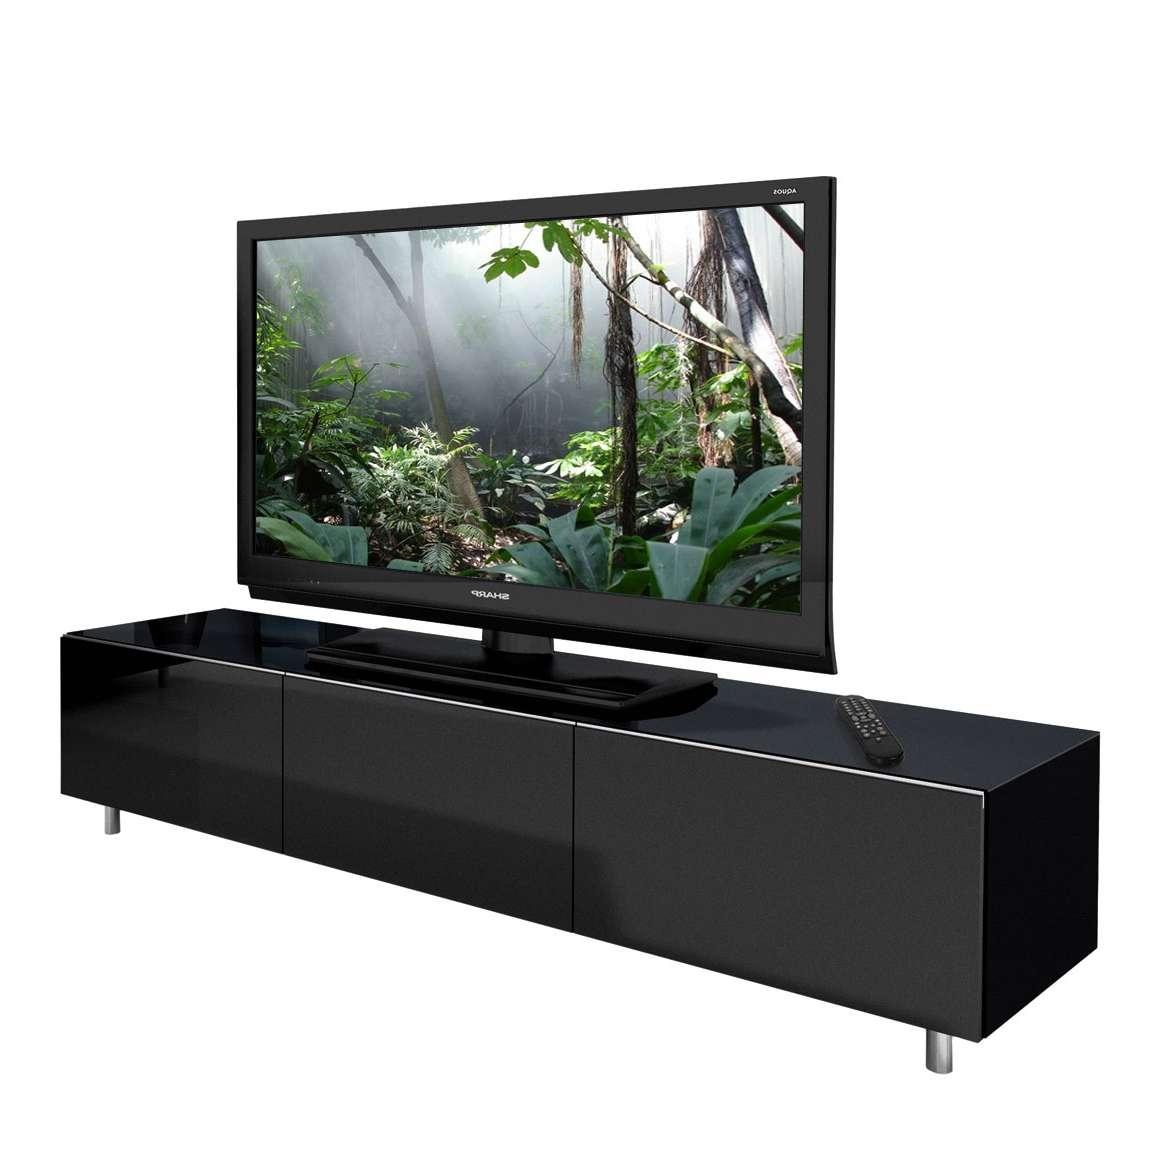 Spectral Just Racks Jrl1650s Gloss Black Tv Cabinet – Just Racks Regarding Black Gloss Tv Stands (View 2 of 15)